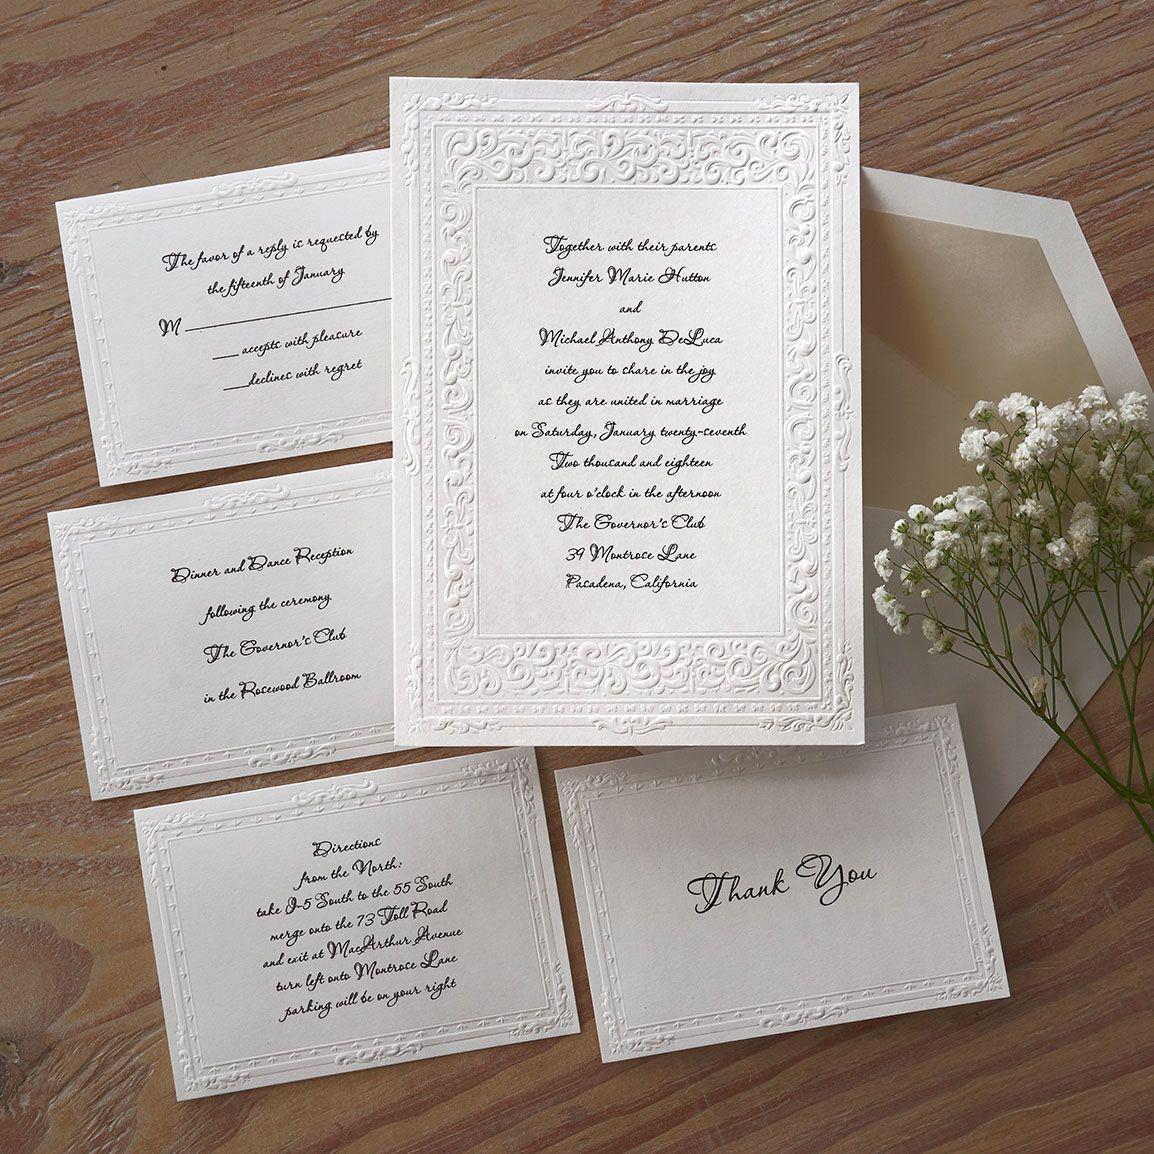 Queen Victoria Wedding Invitations The American Wedding Http Www